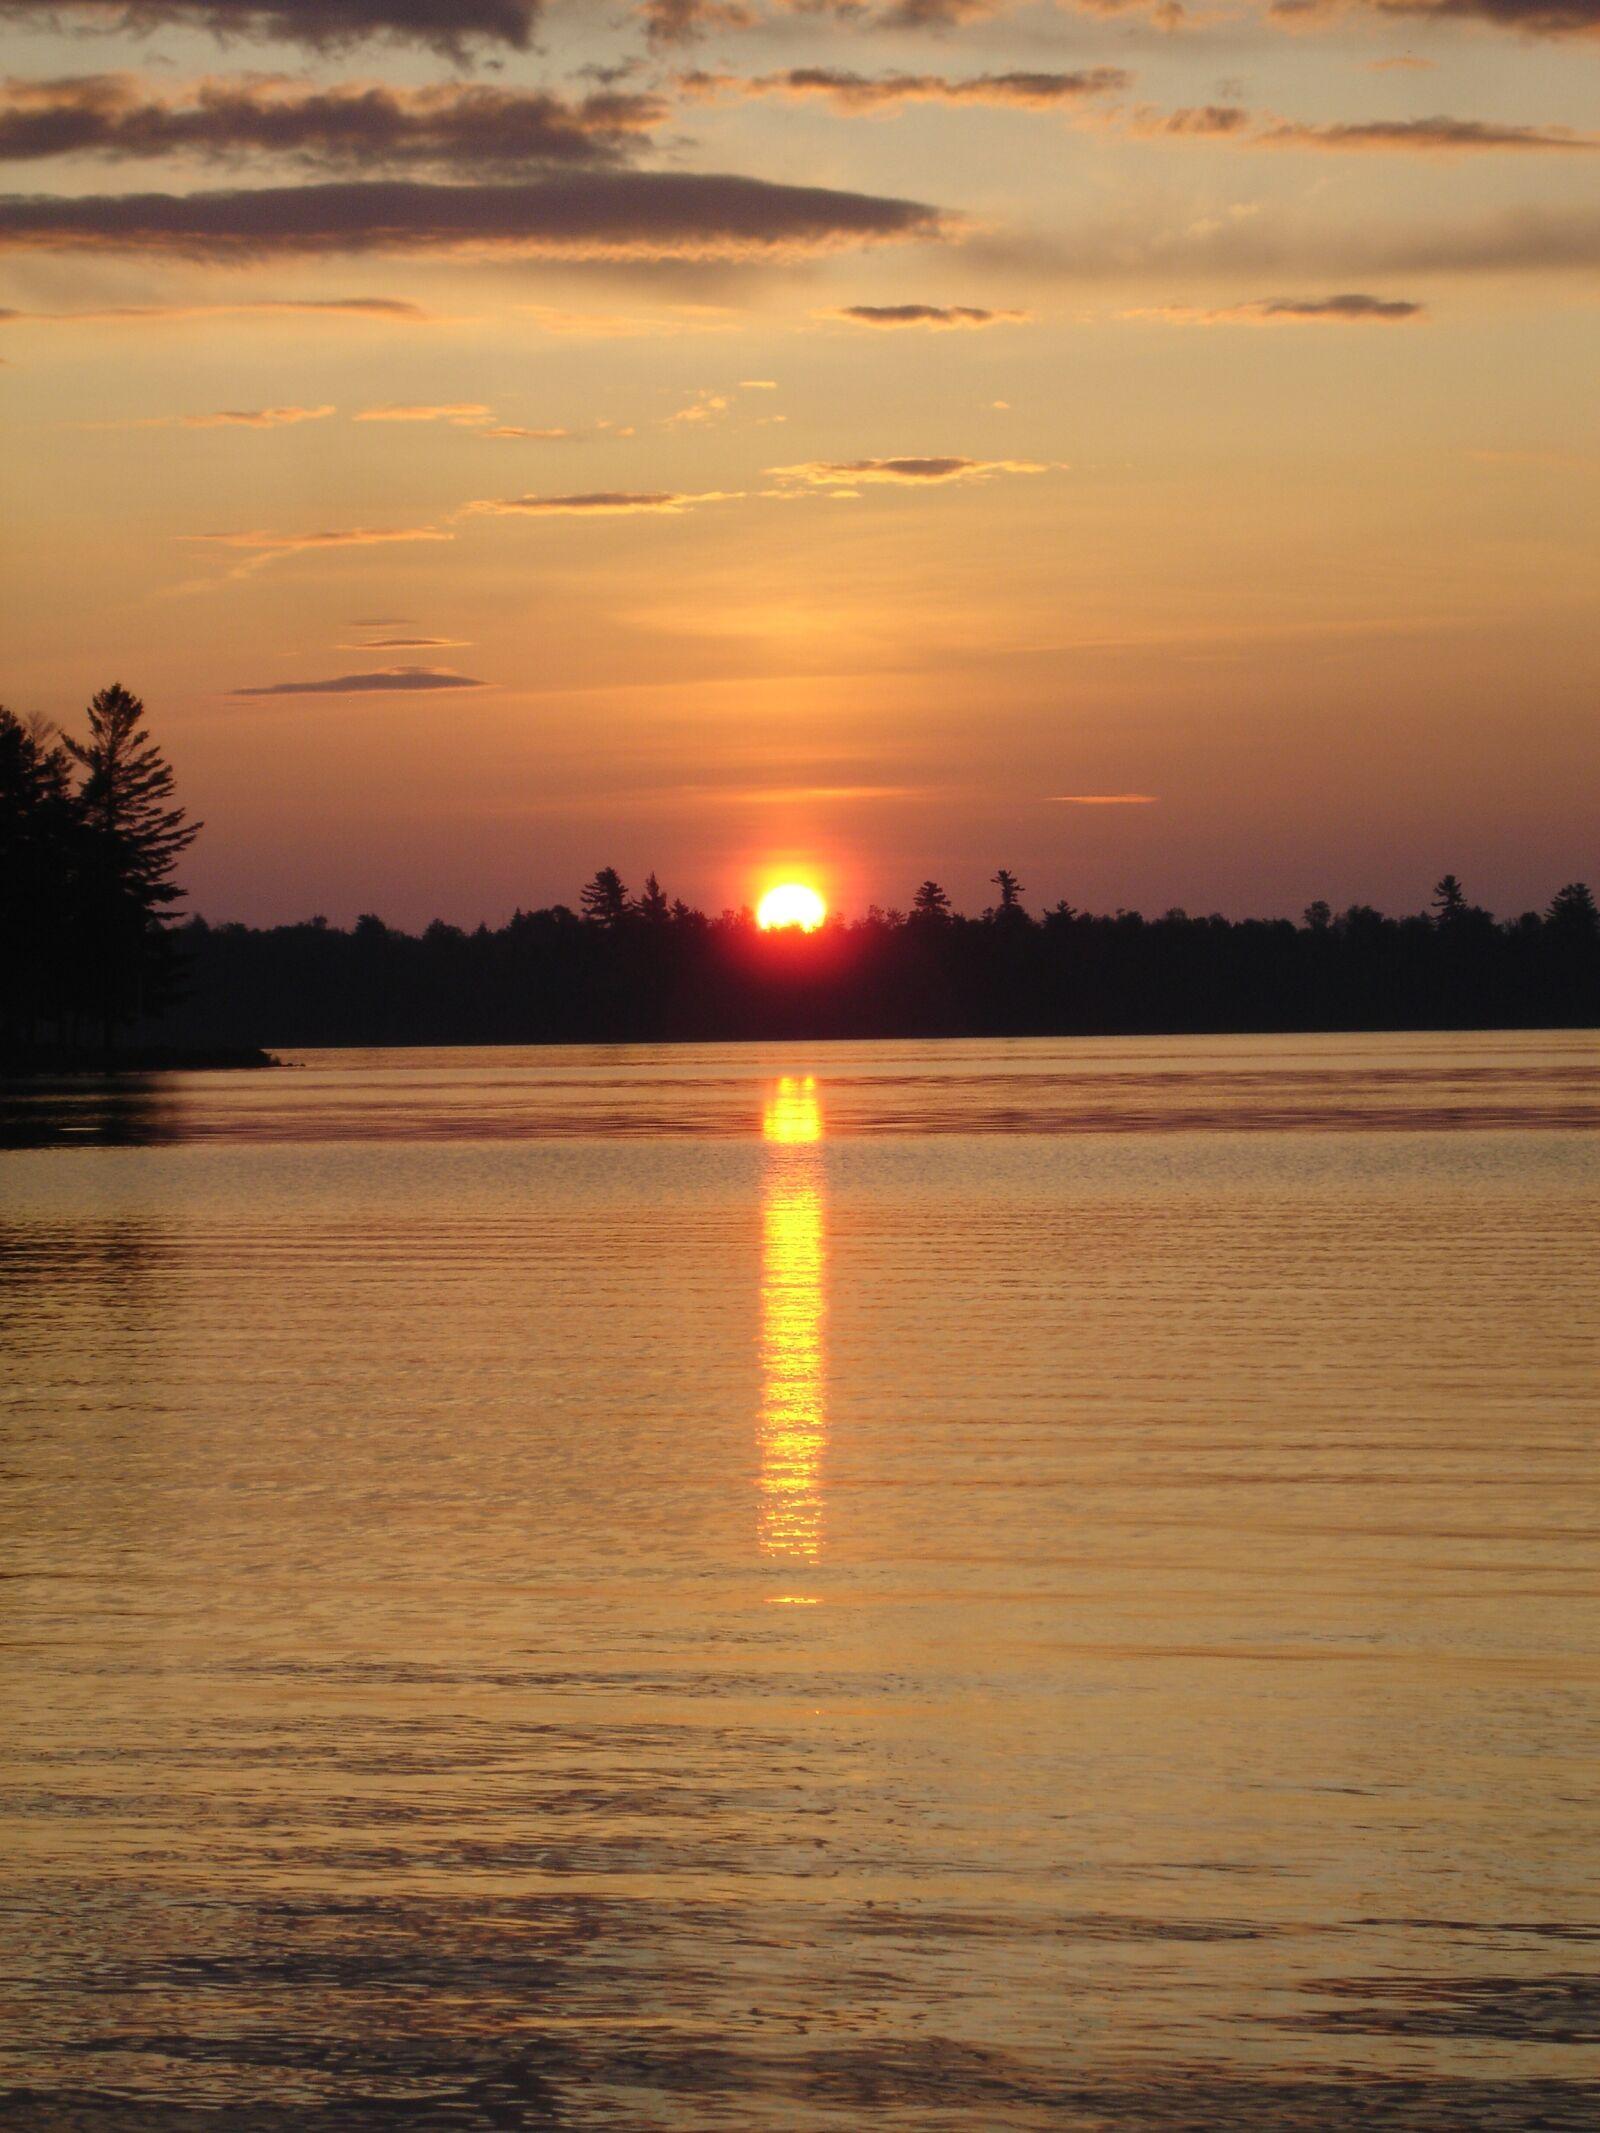 sunset, reflection, water